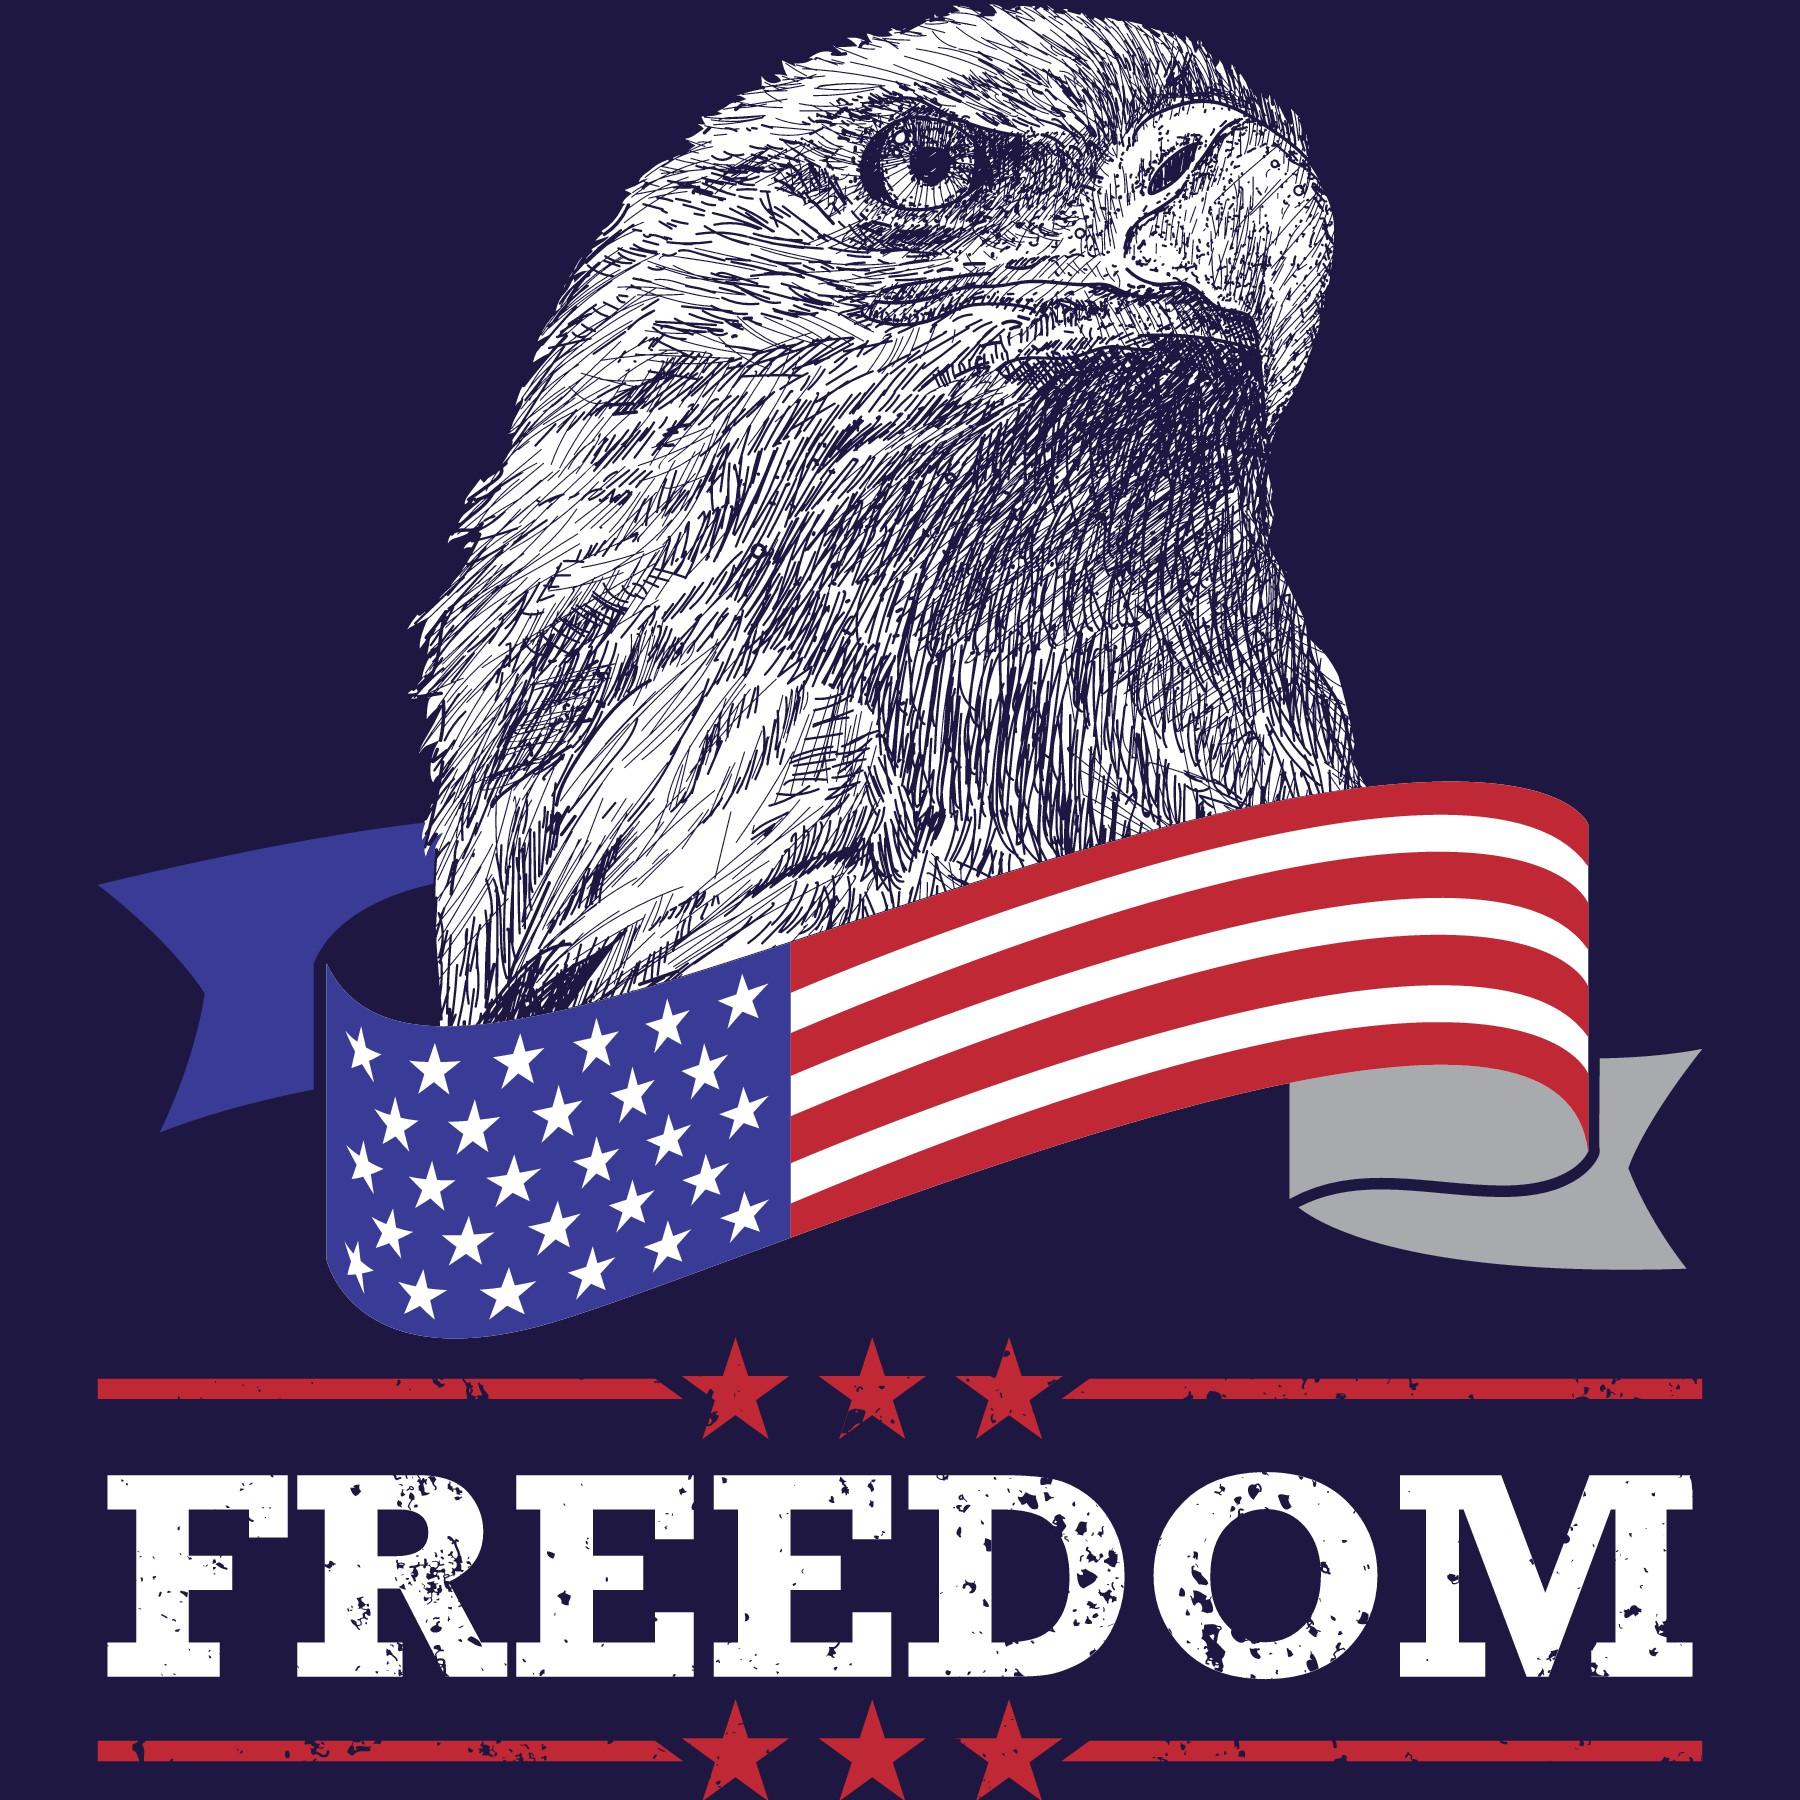 Design a Patriotic T-Shirt for Summer